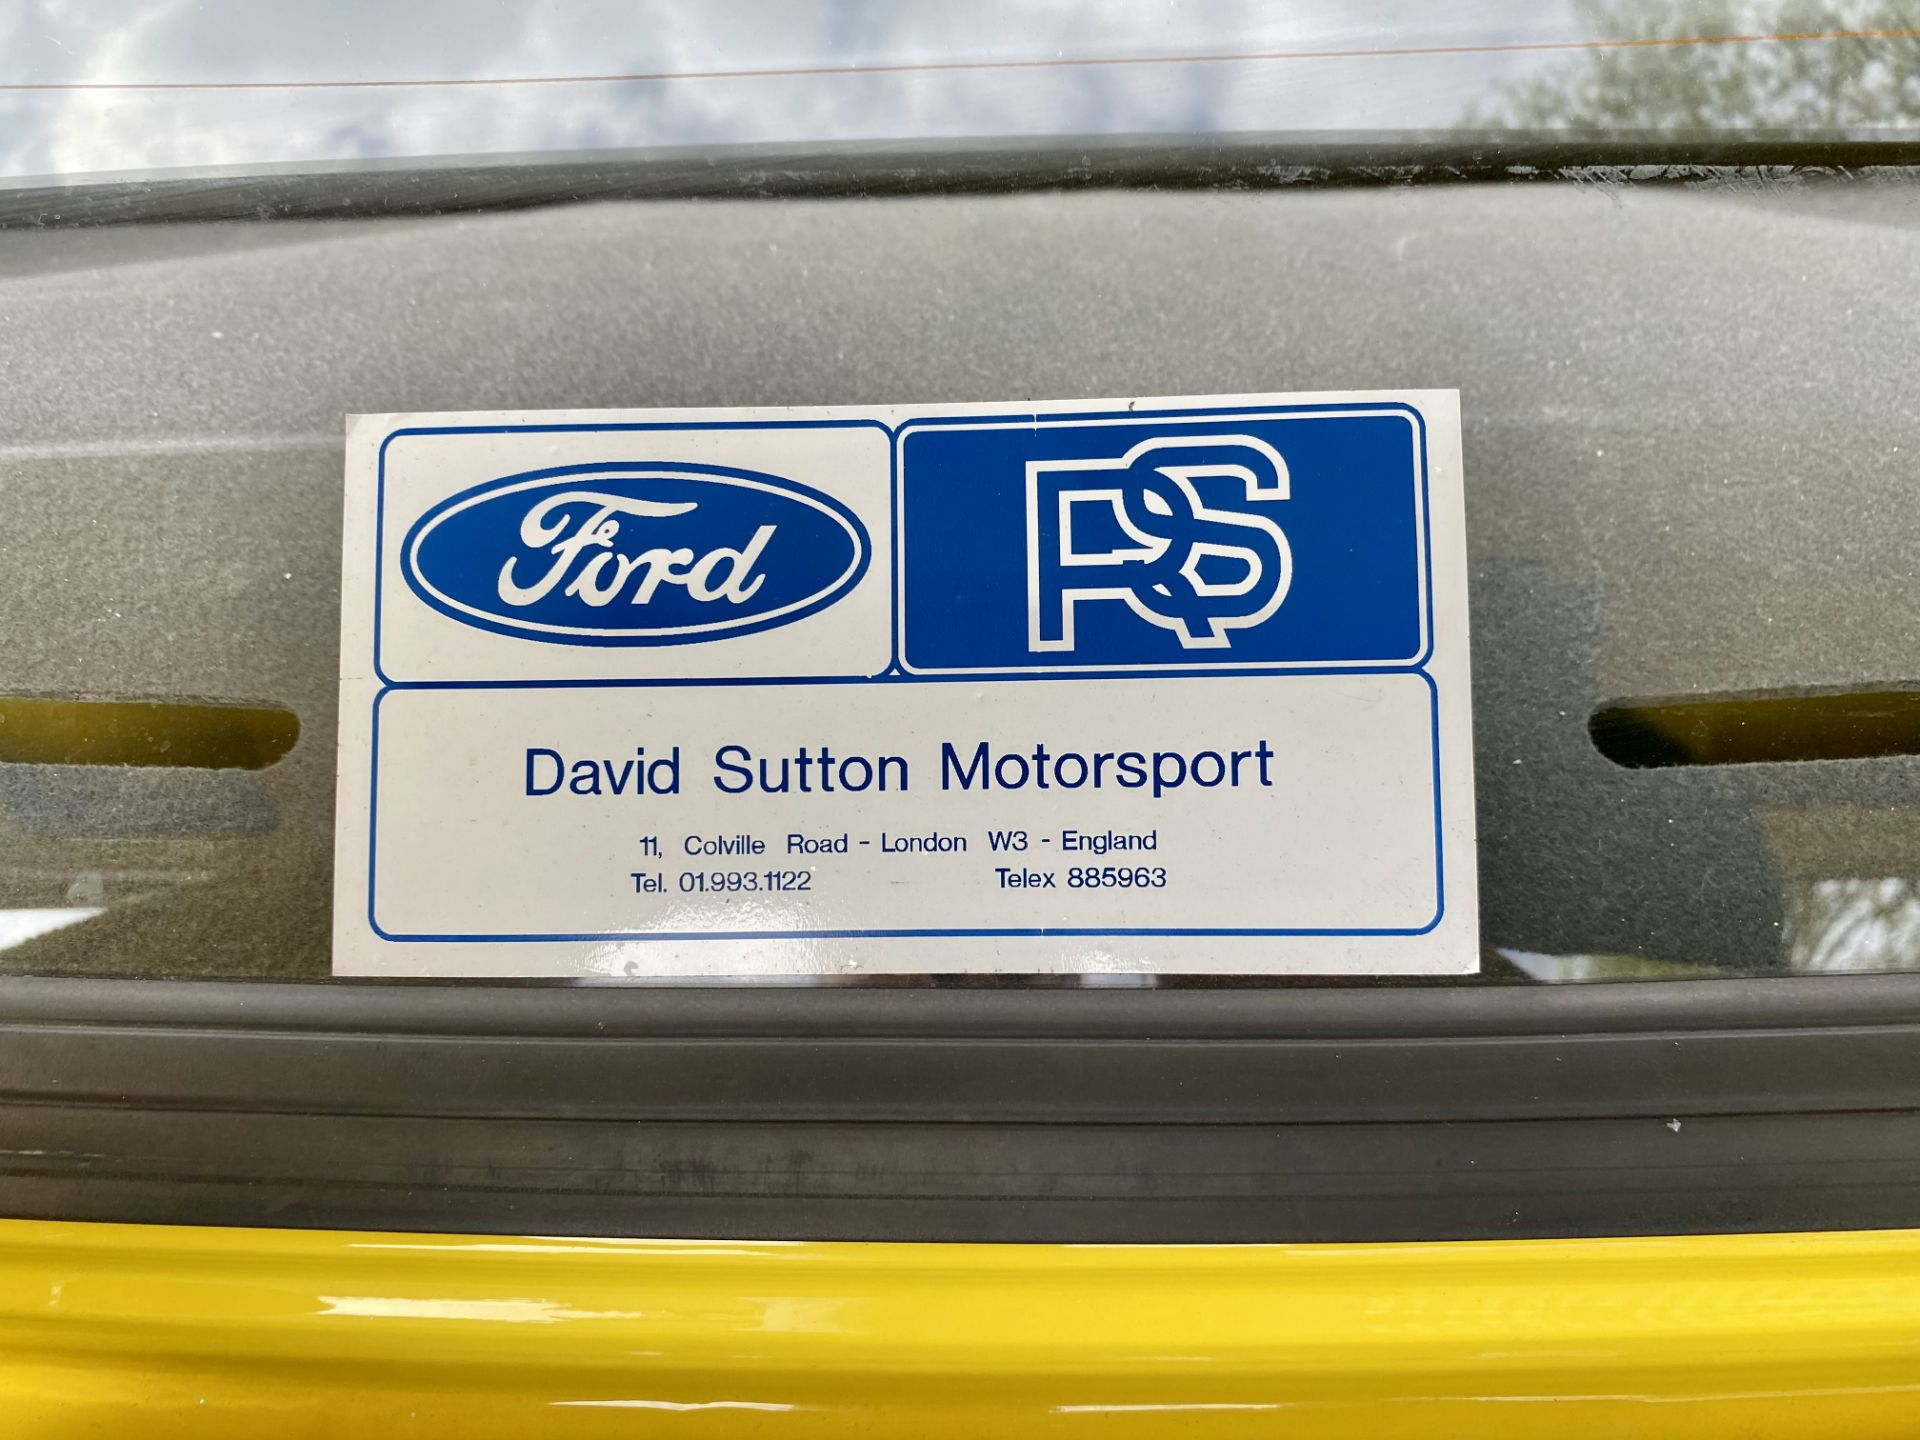 Ford Escort MK2 - Image 53 of 58